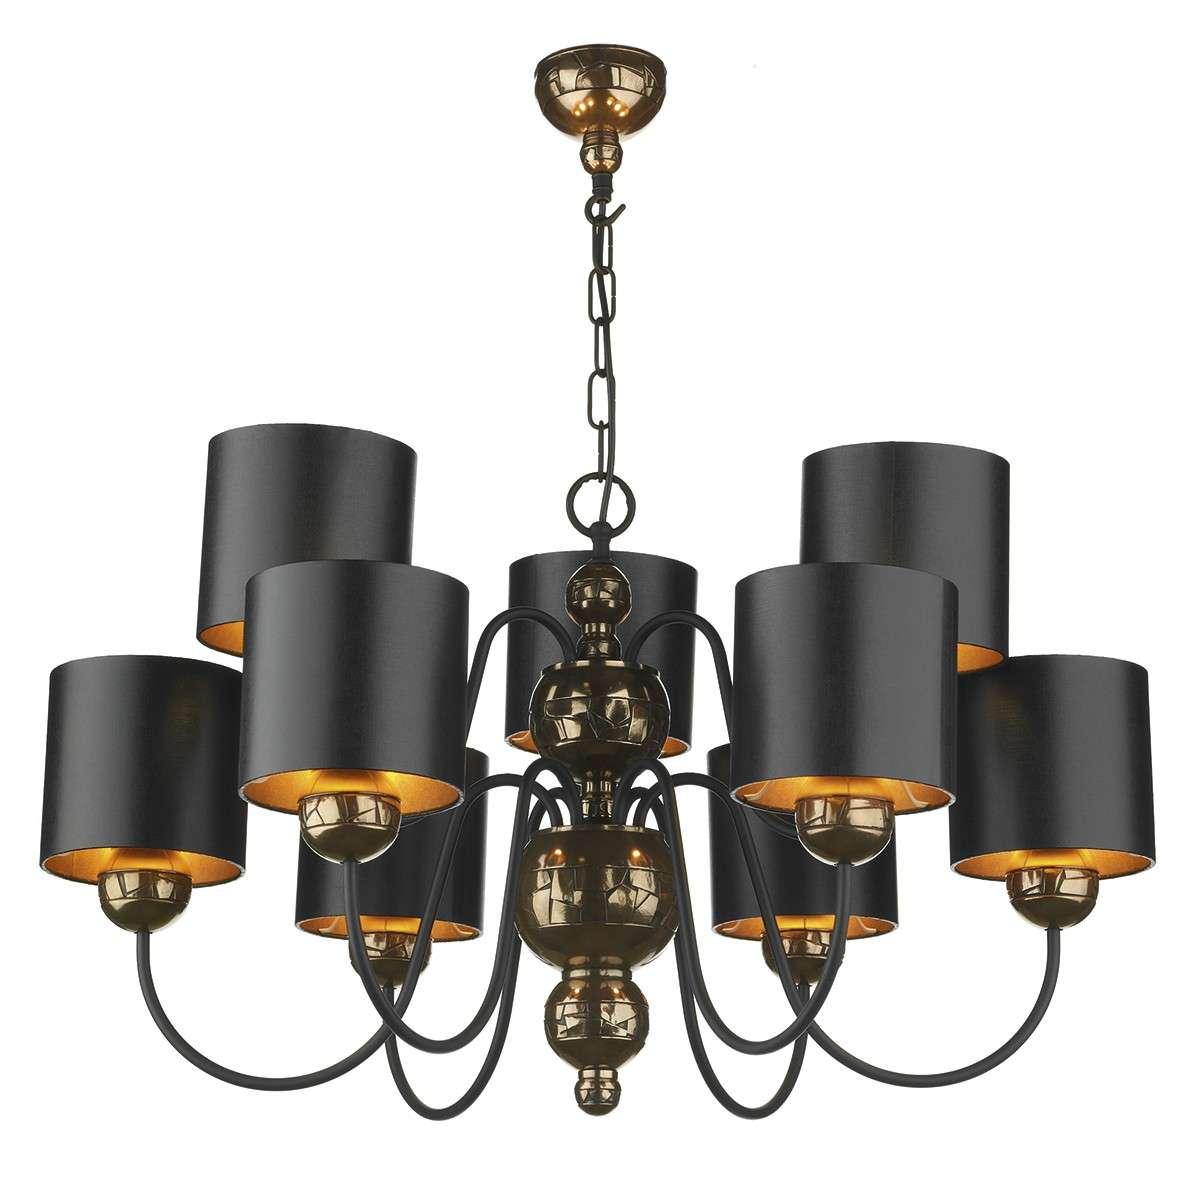 Garbo 9 Light Pendant Bronze complete with Black Bronze Shades